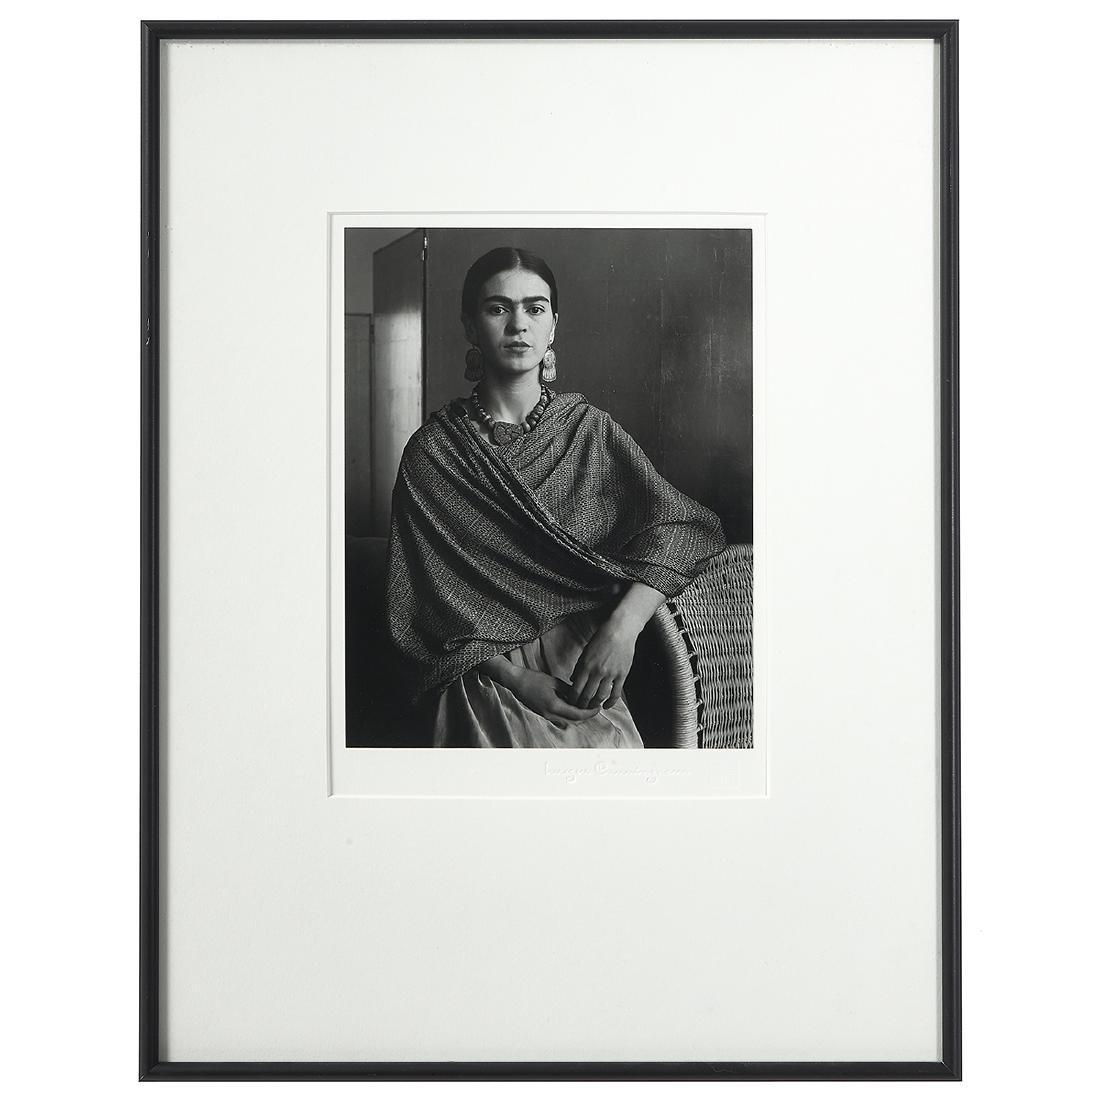 Imogen Cunningham, Frida Kahlo Rivera - 2